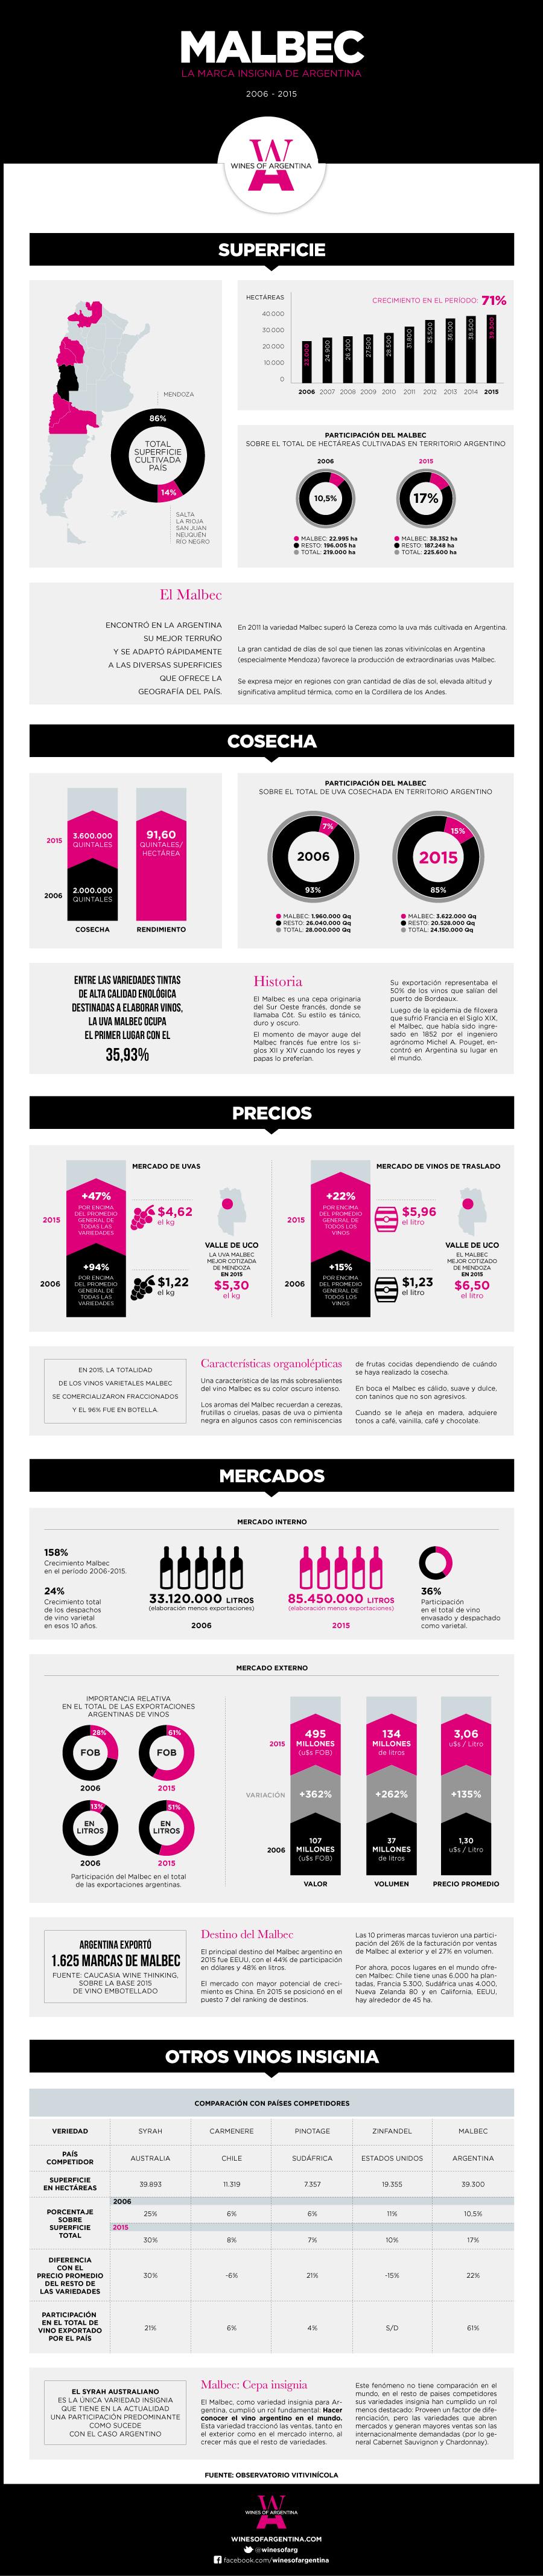 InfografiaMALBEC